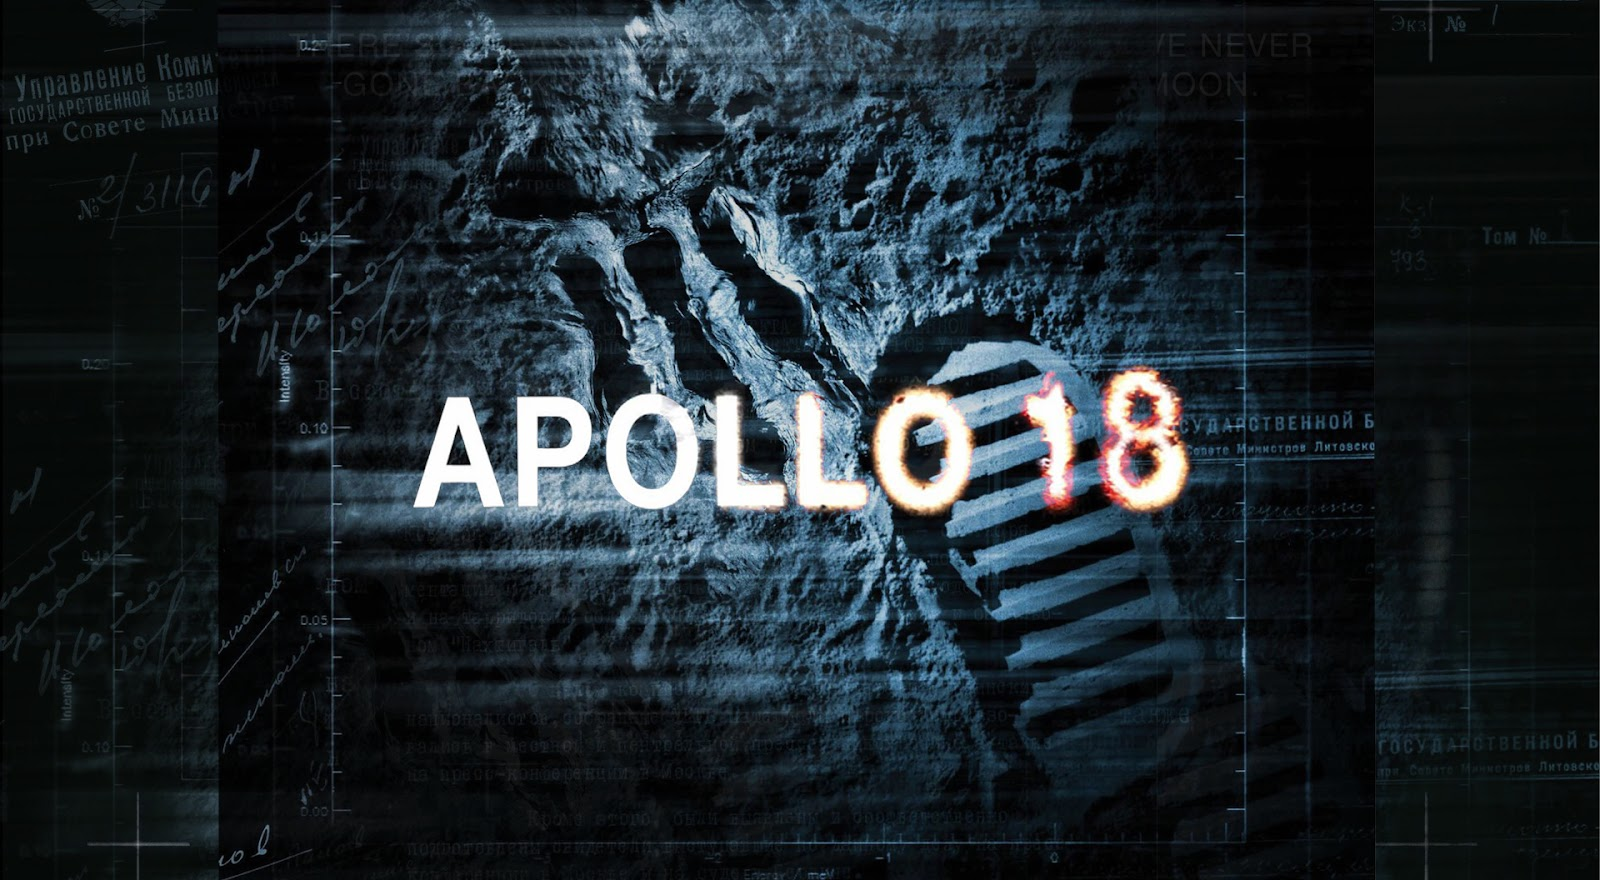 http://4.bp.blogspot.com/-B-4BNlxj3hU/TkUJl_oXMmI/AAAAAAAAA9E/mibWHNNpHc4/s1600/Apollo-18-Wallpapers-5.jpg